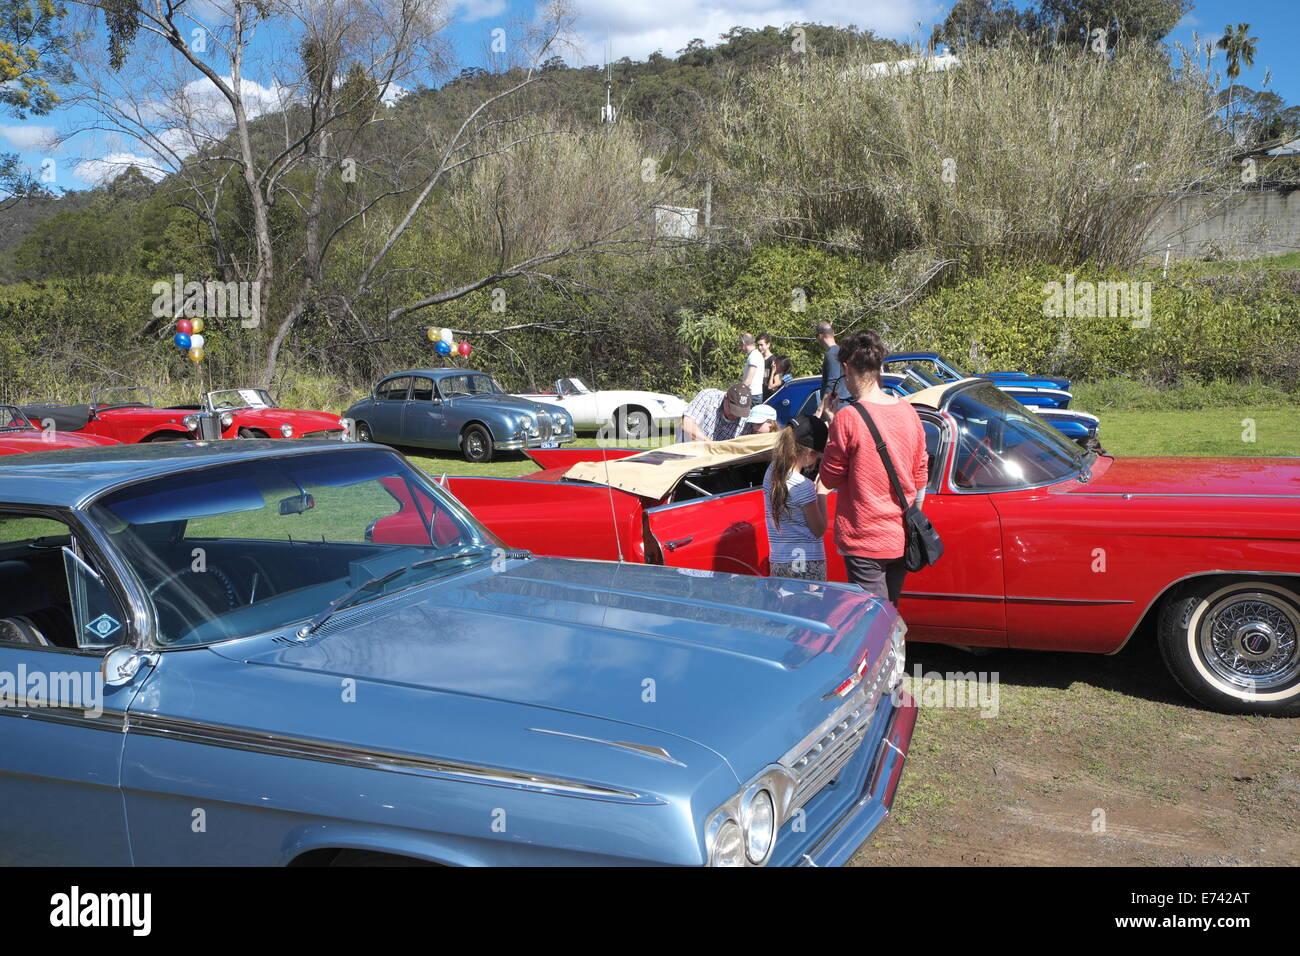 Renting Classic Cars Uk